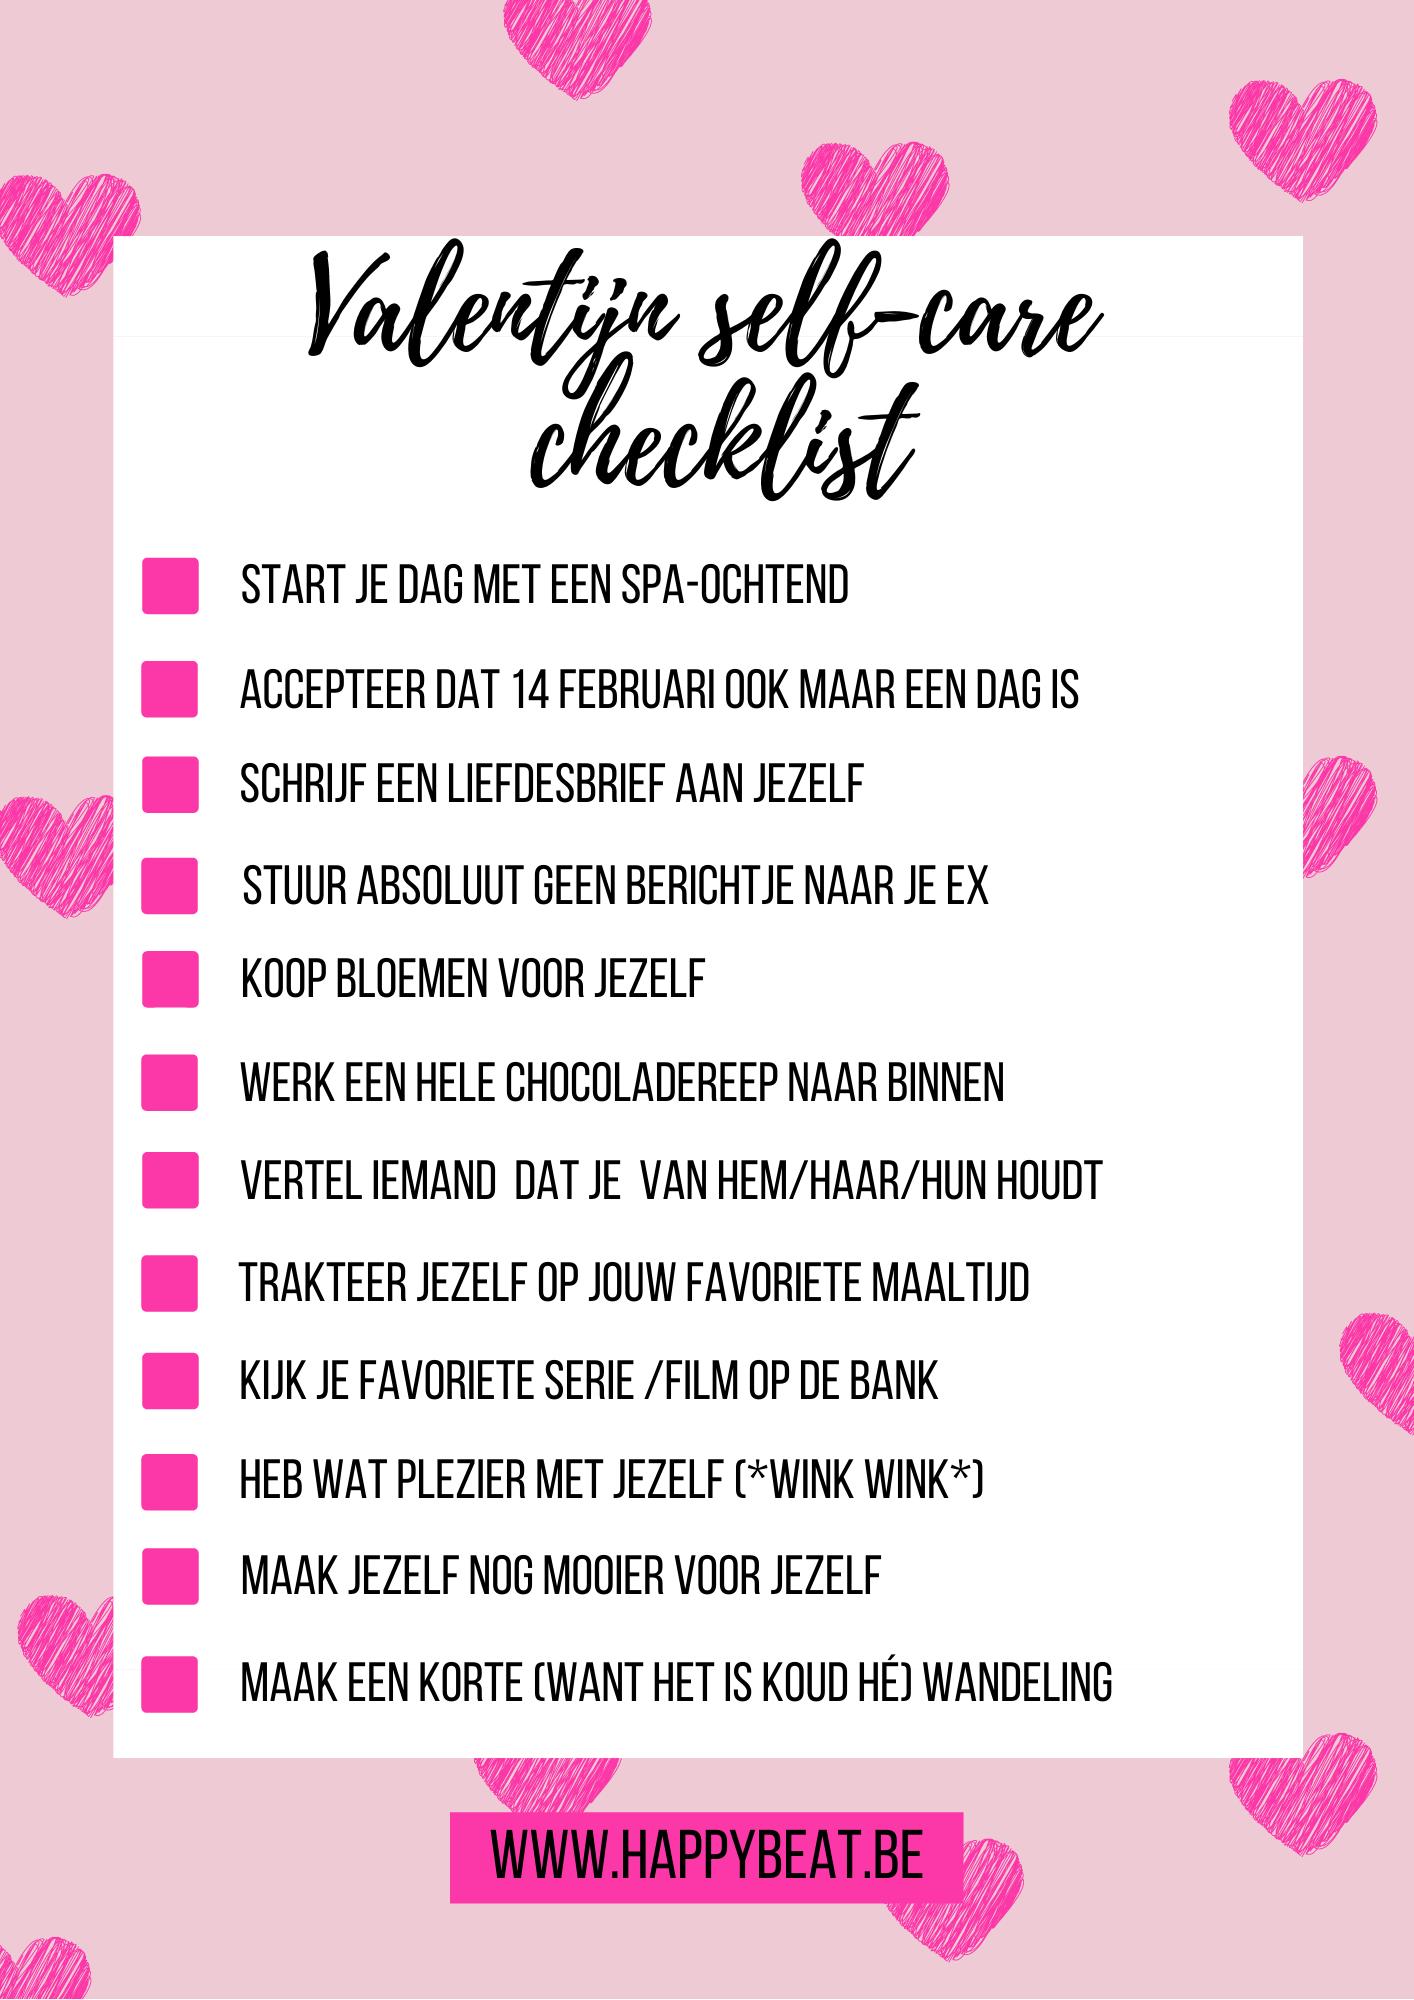 Checklist boordevol items die jij als single kan doen op Valentijnsdag